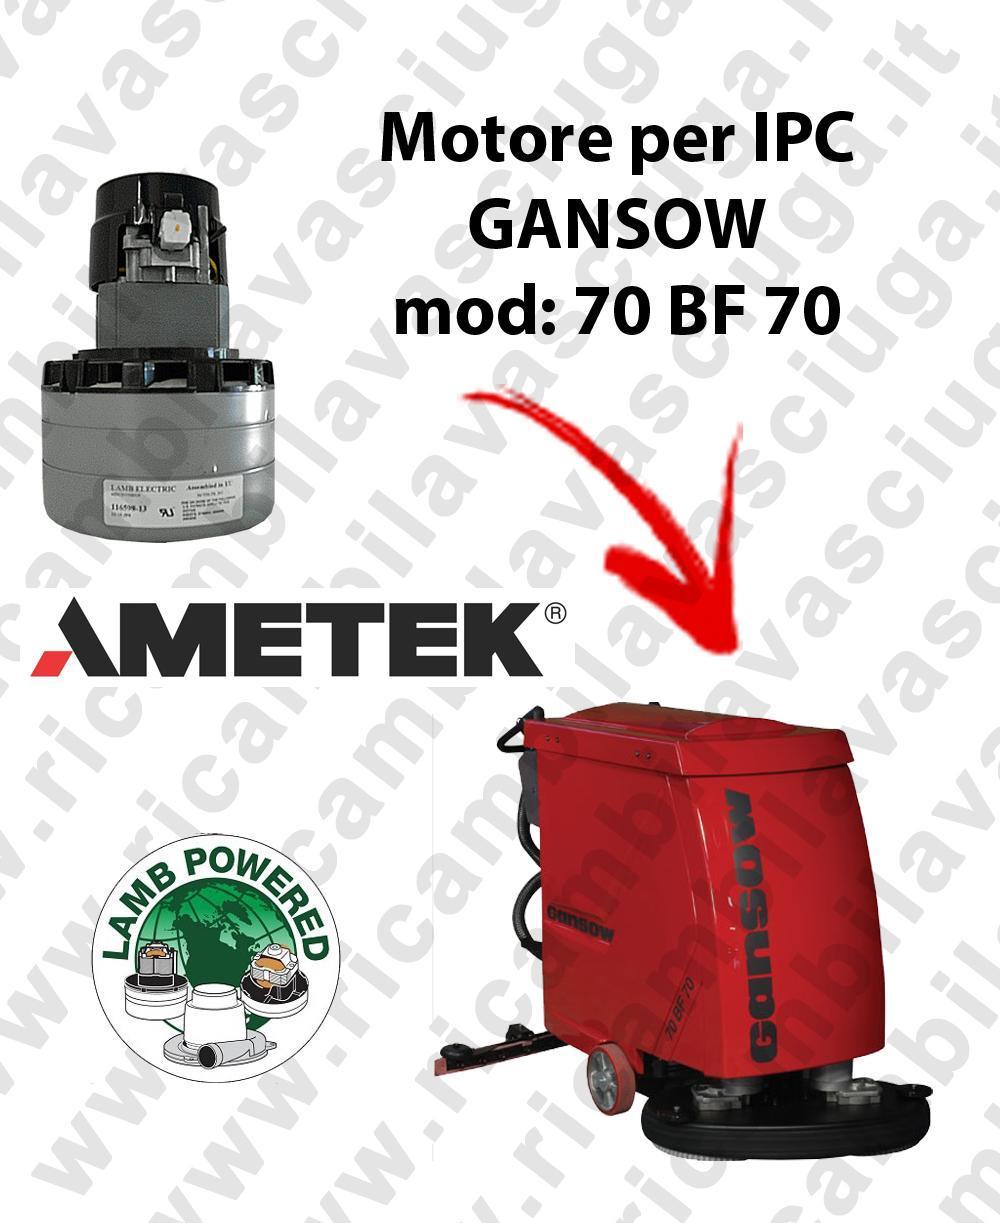 70 BF 70 LAMB AMETEK vacuum motor for scrubber dryer IPC GANSOW